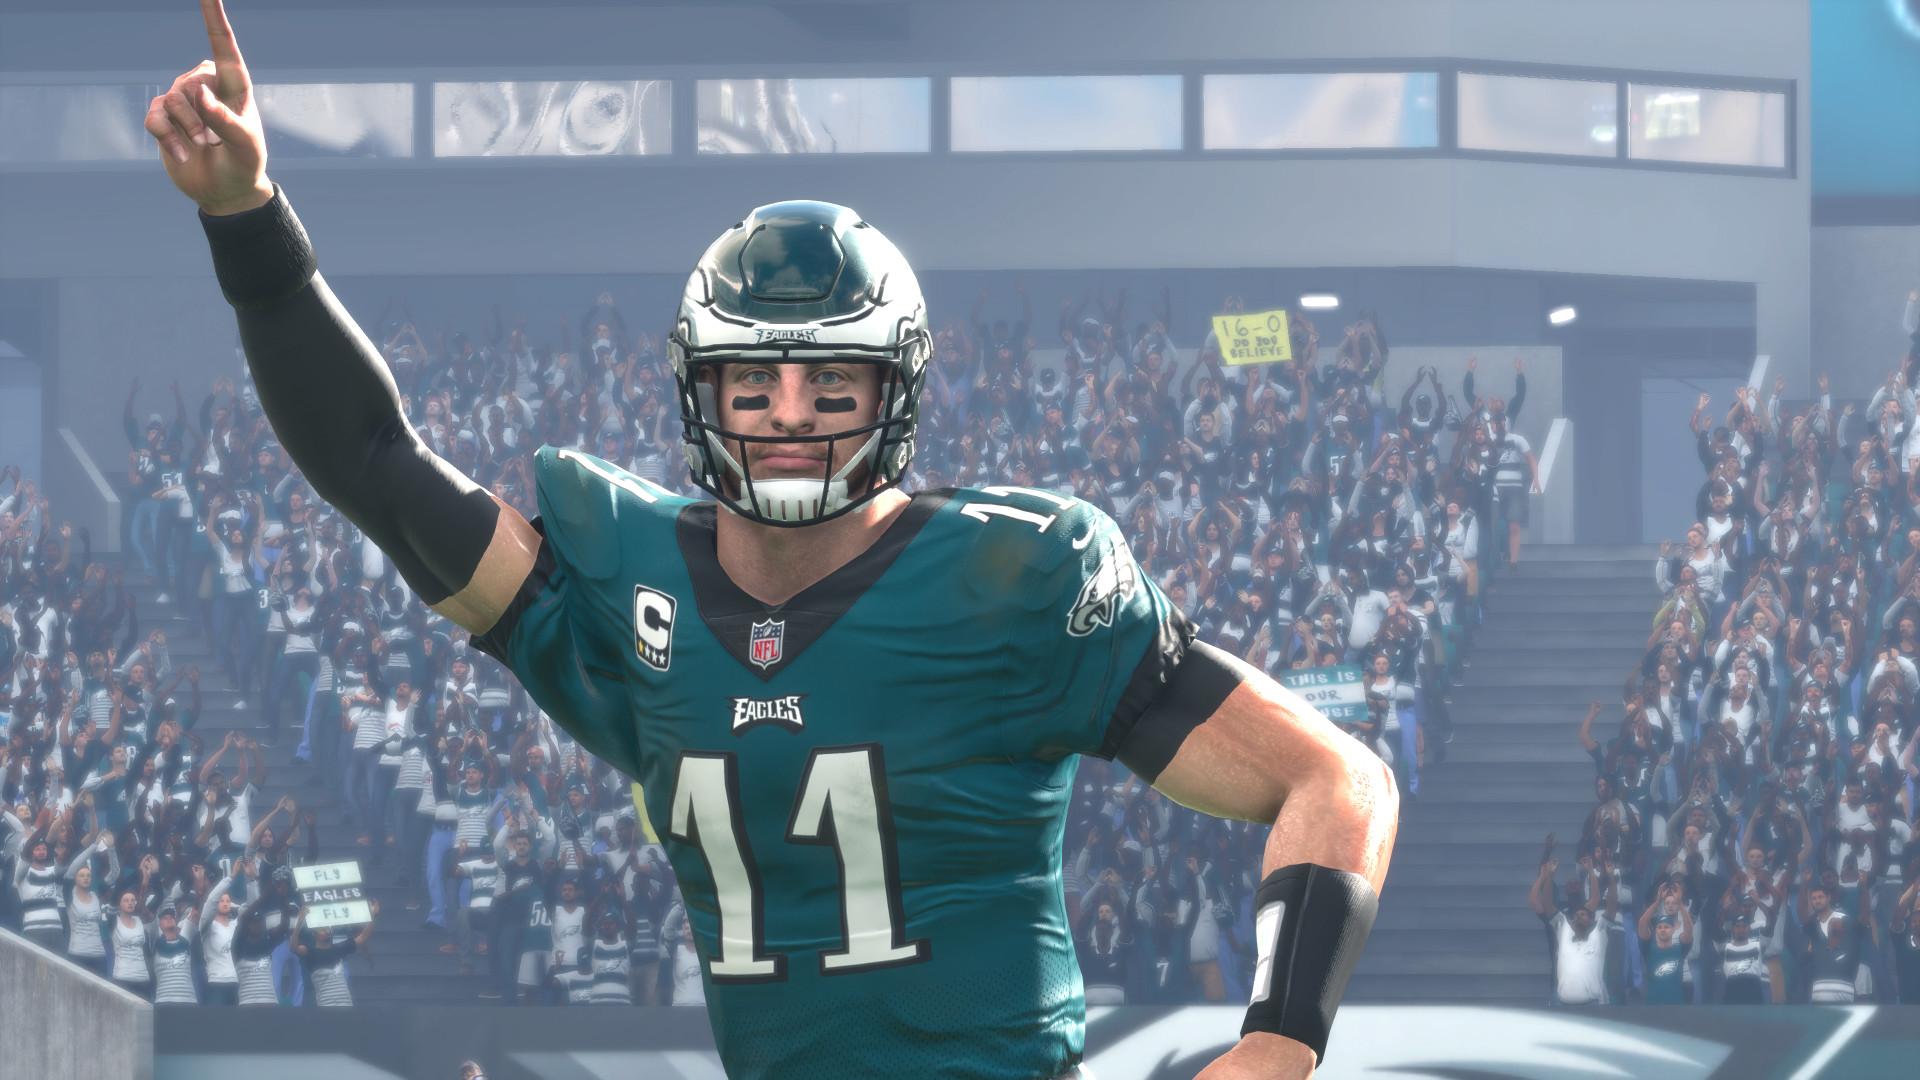 Get on the Sticks: Madden 19 Philadelphia Eagles preview